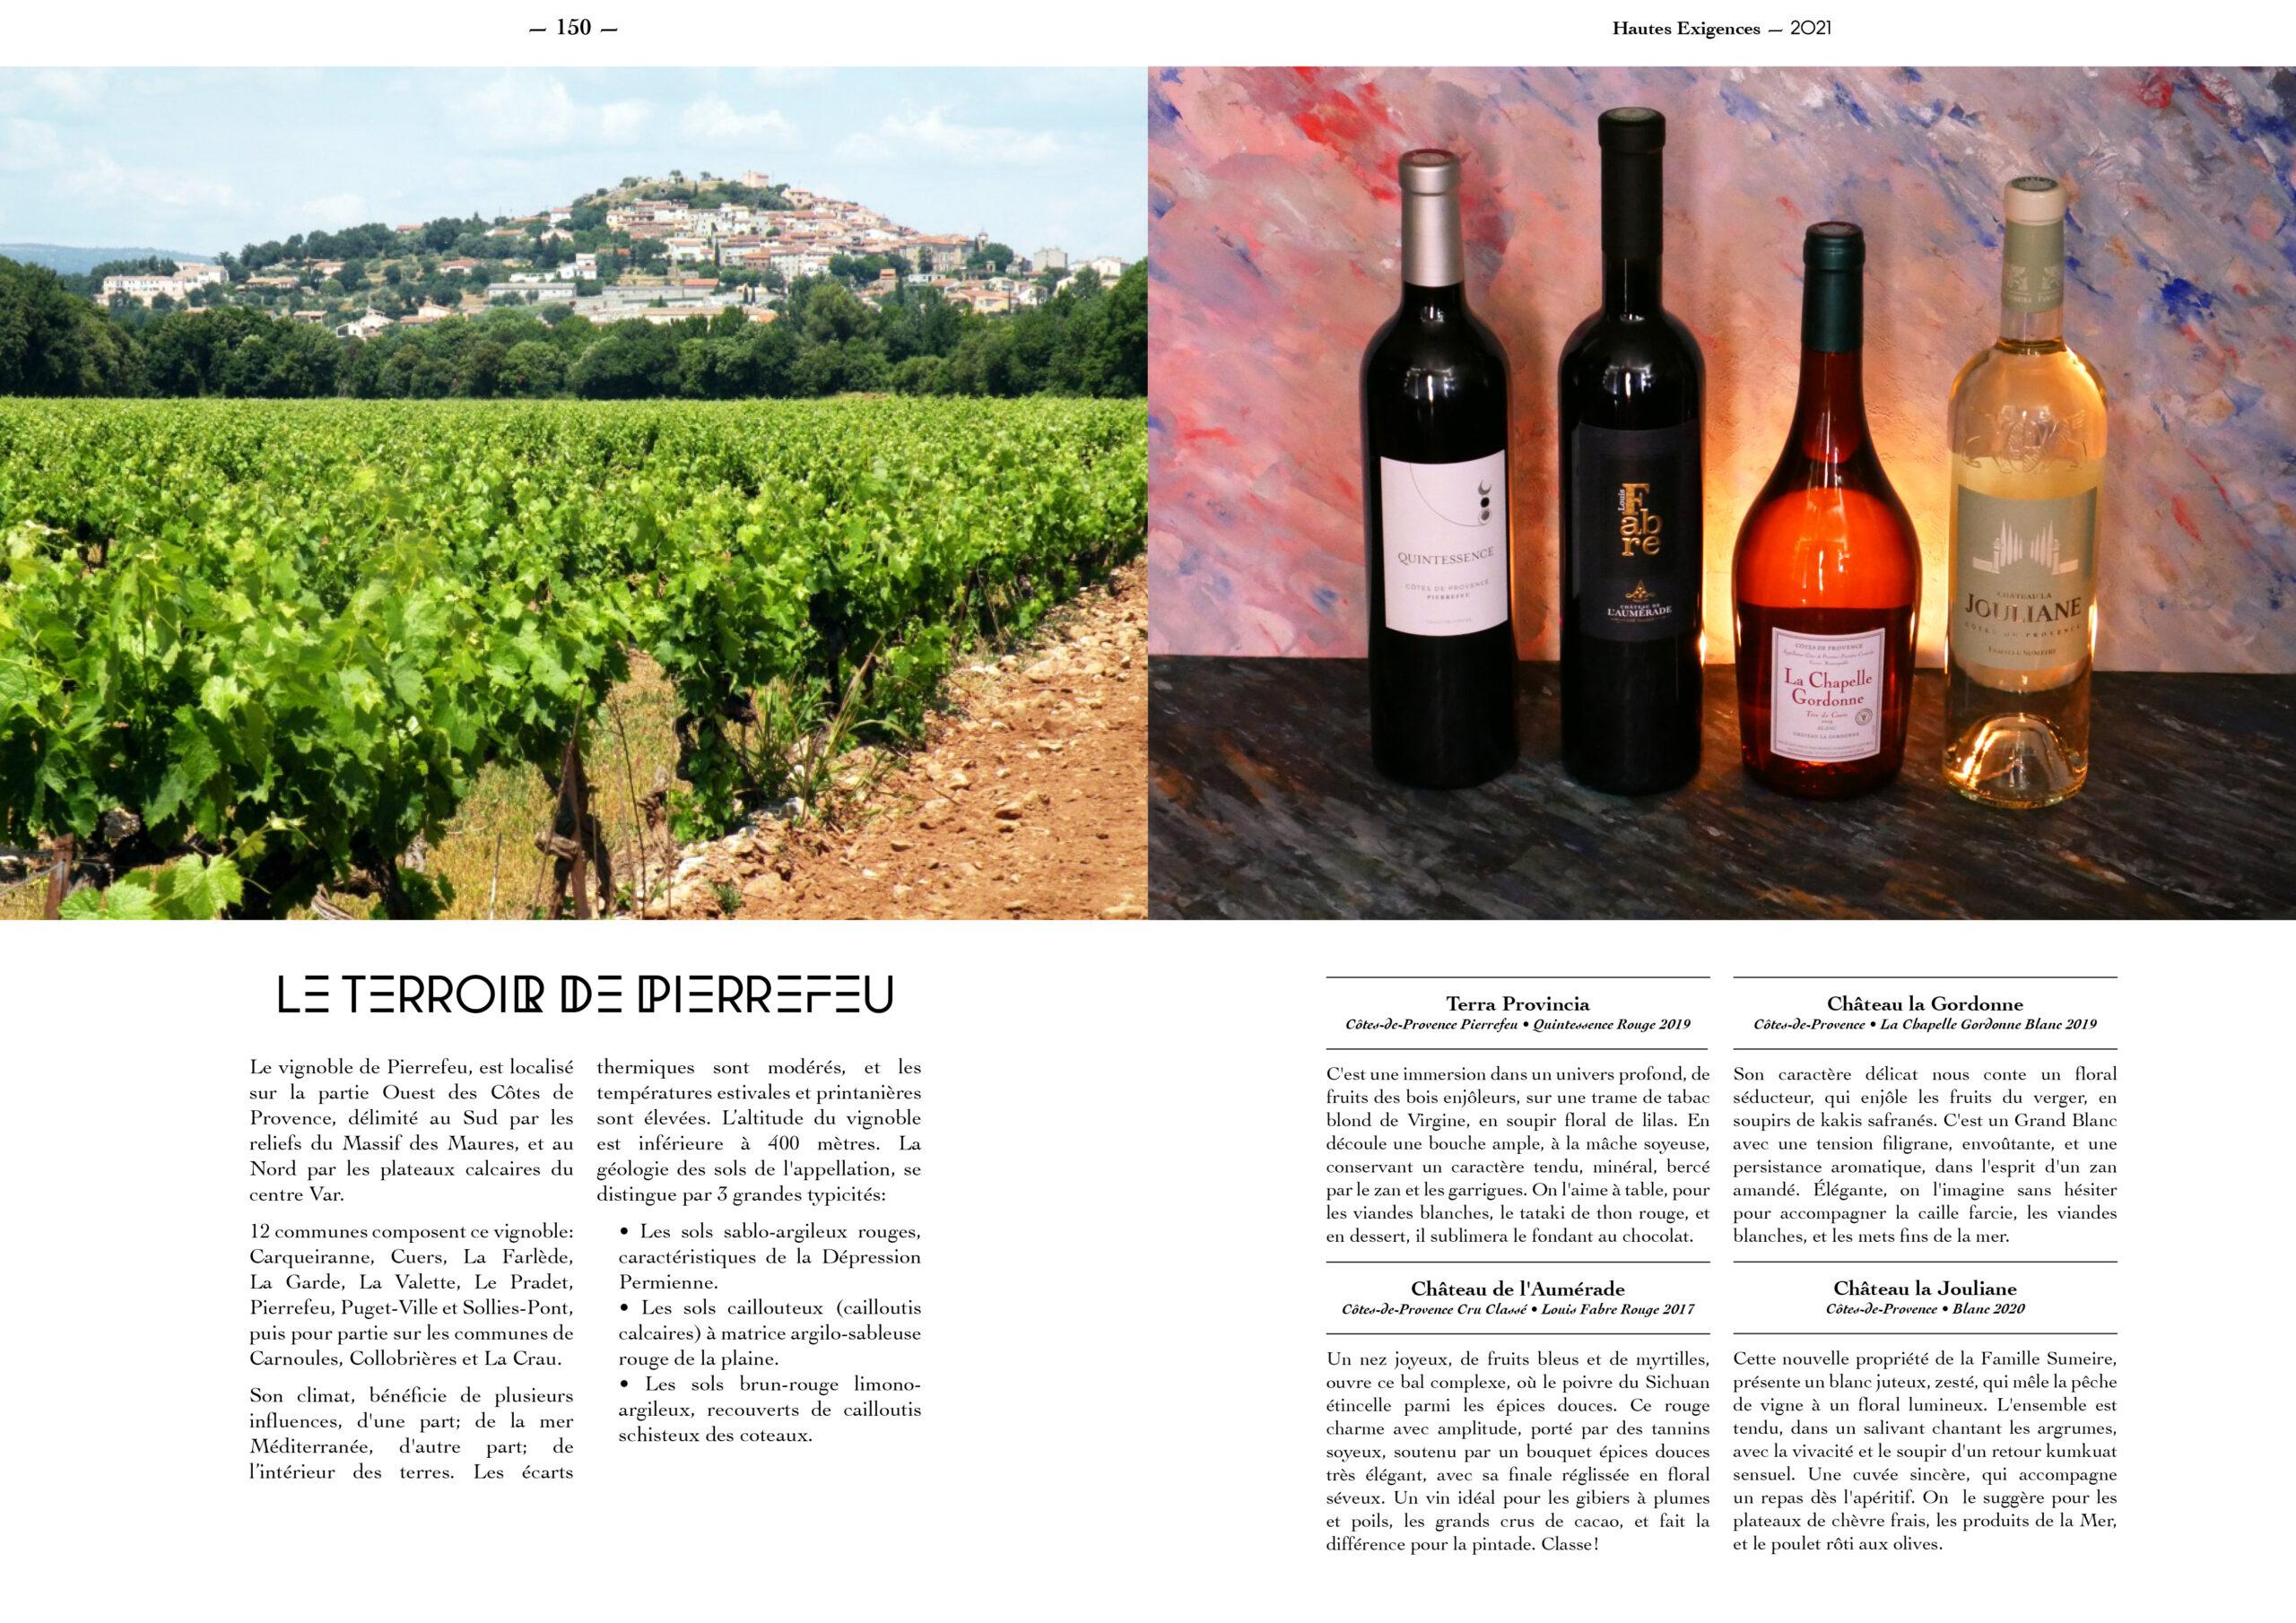 Hautes Exigences Magazine Hors Serie 2021 page 148-149